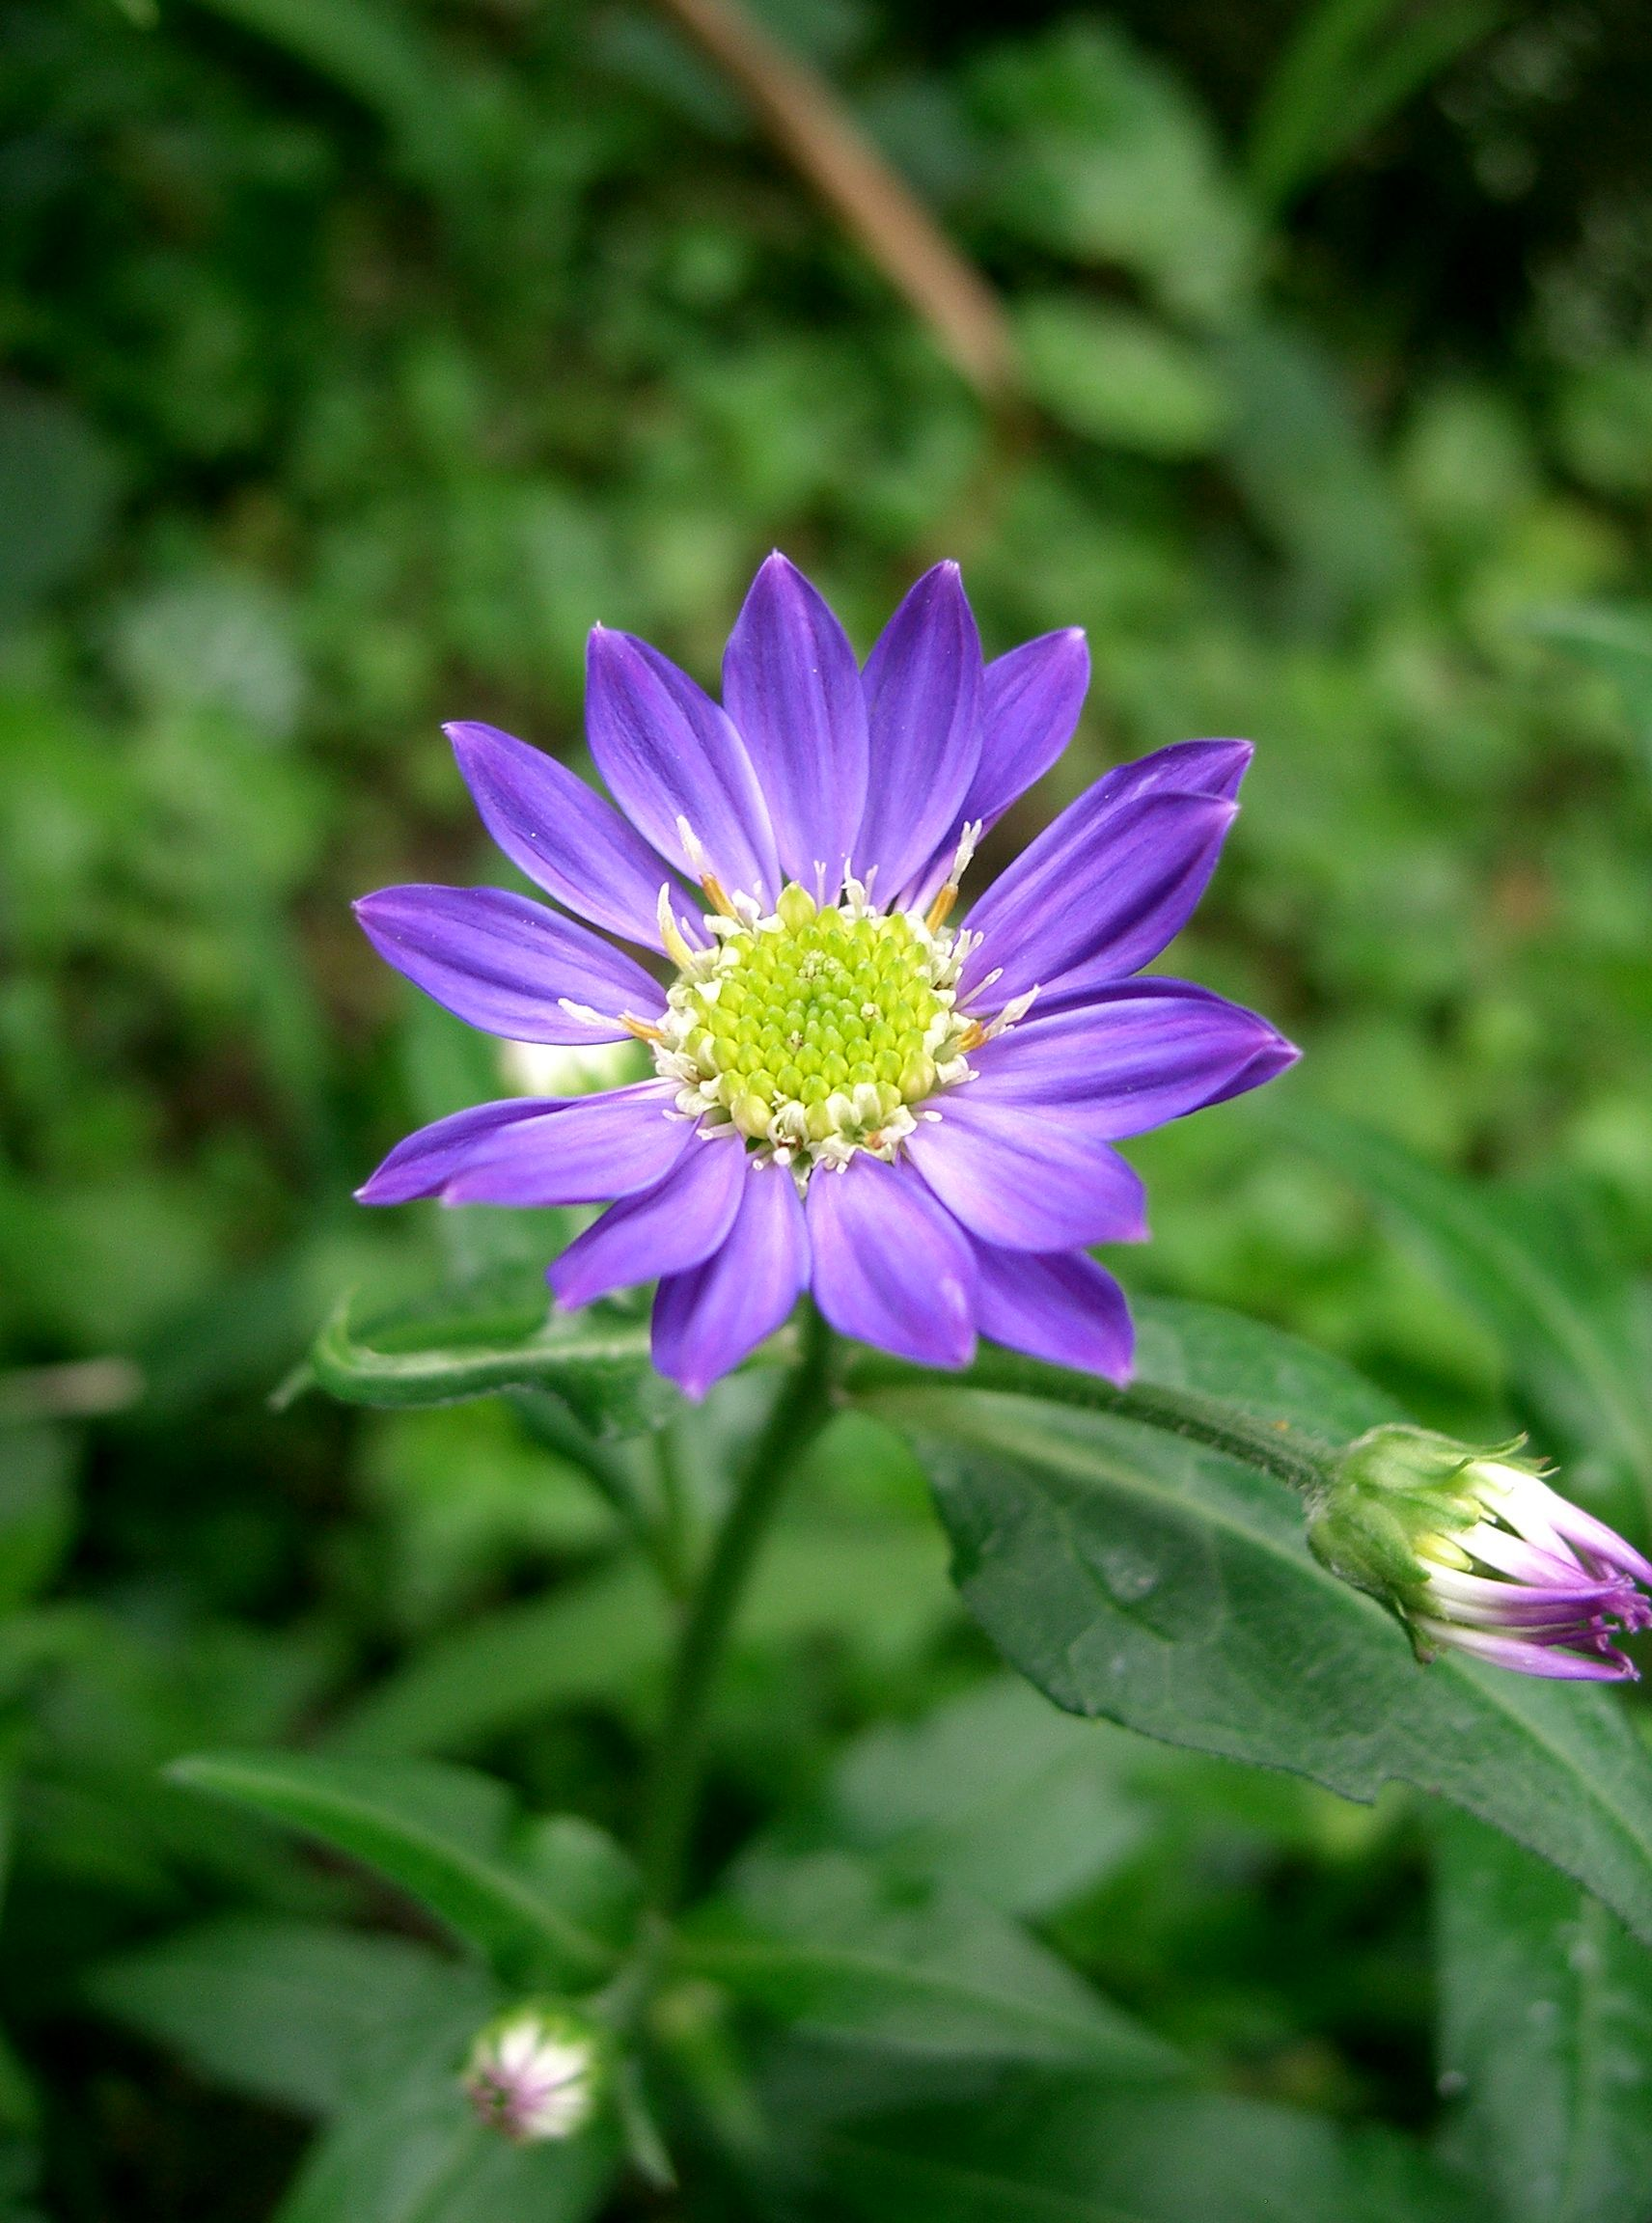 File Gymnaster savatieri1 flower Wikimedia mons